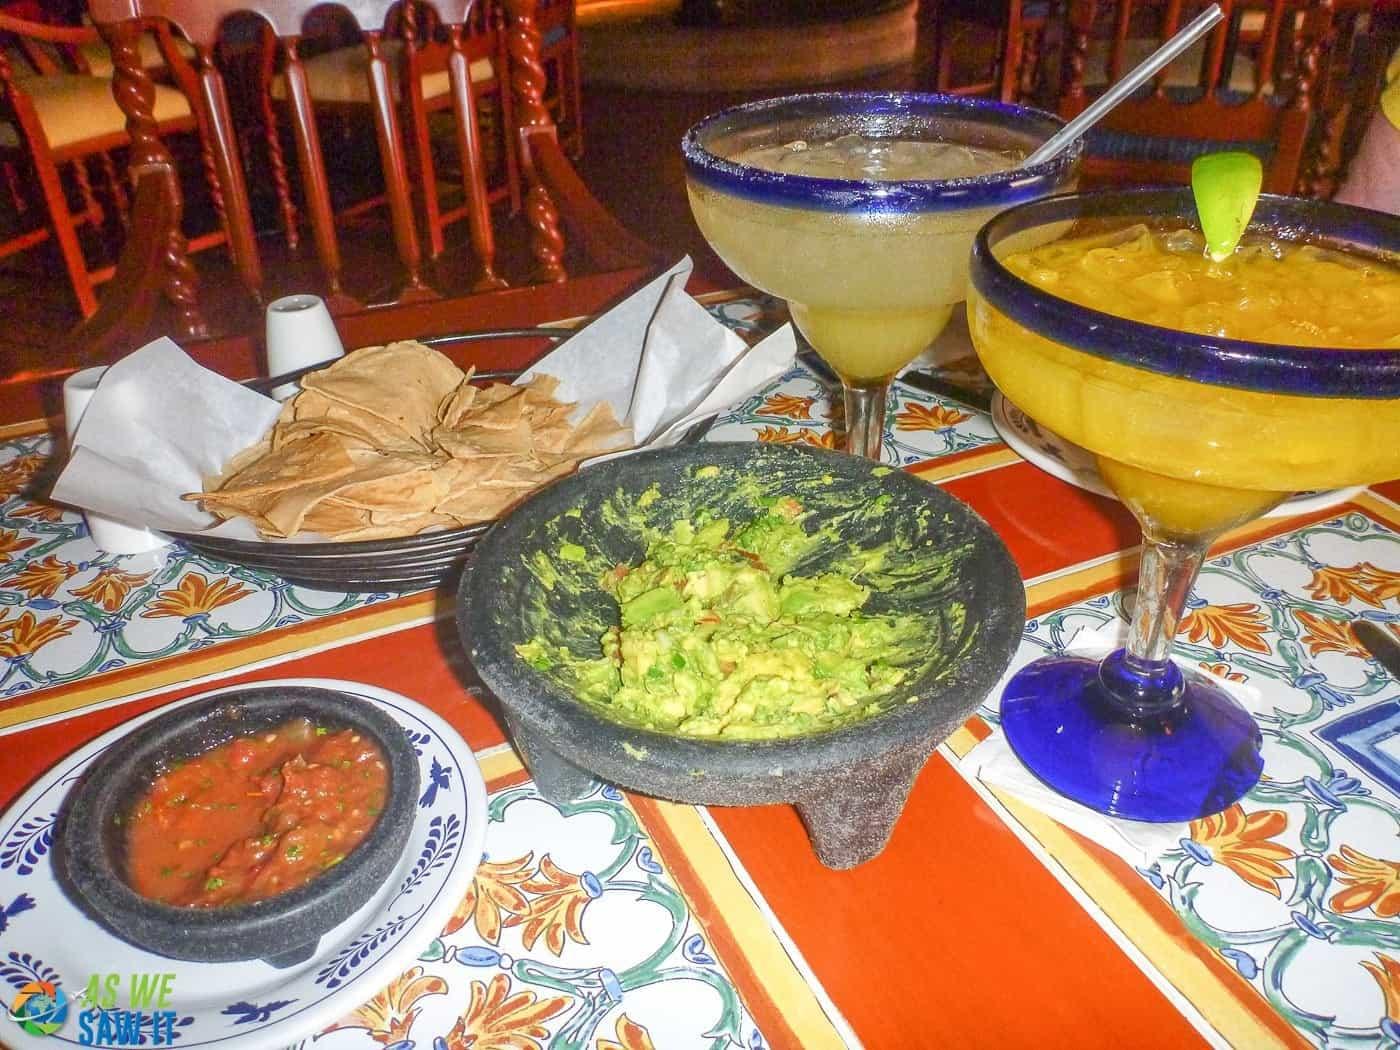 Margaritas and Guacamole in Cancun Mexico